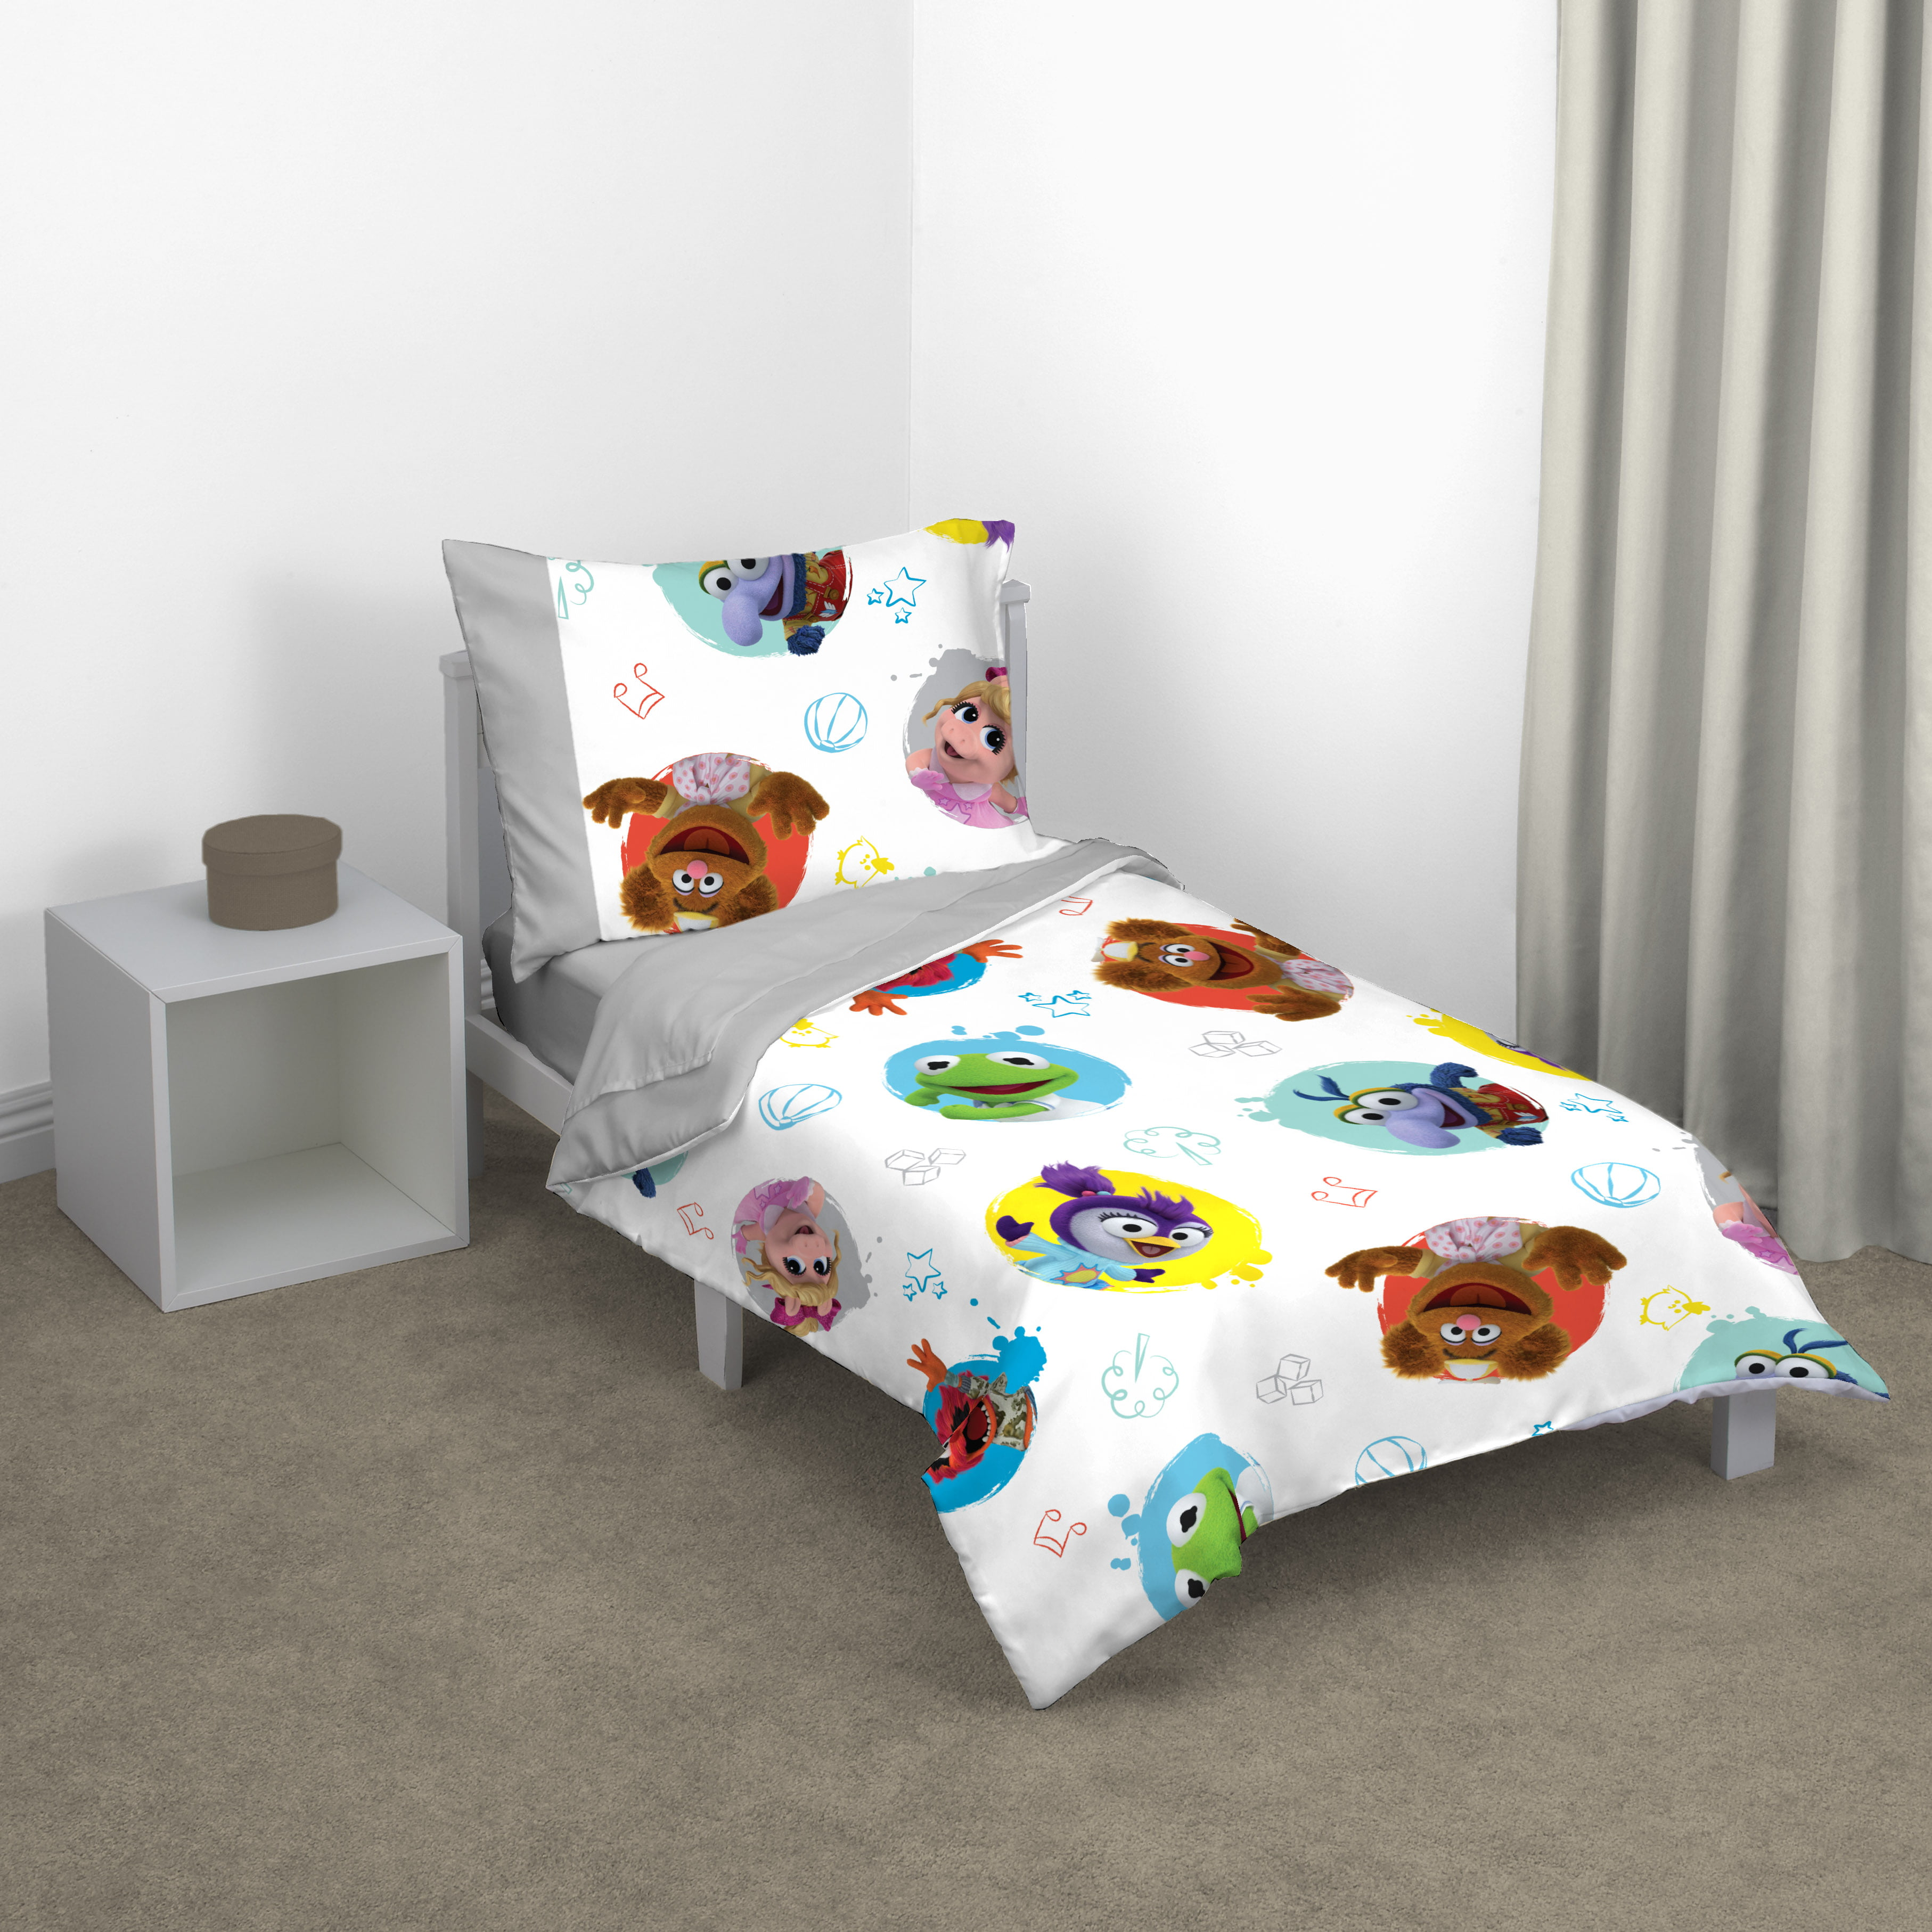 Blue//Red//Yellow//Green Disney Puppy Dog Pals 4 Piece Toddler Bed Set